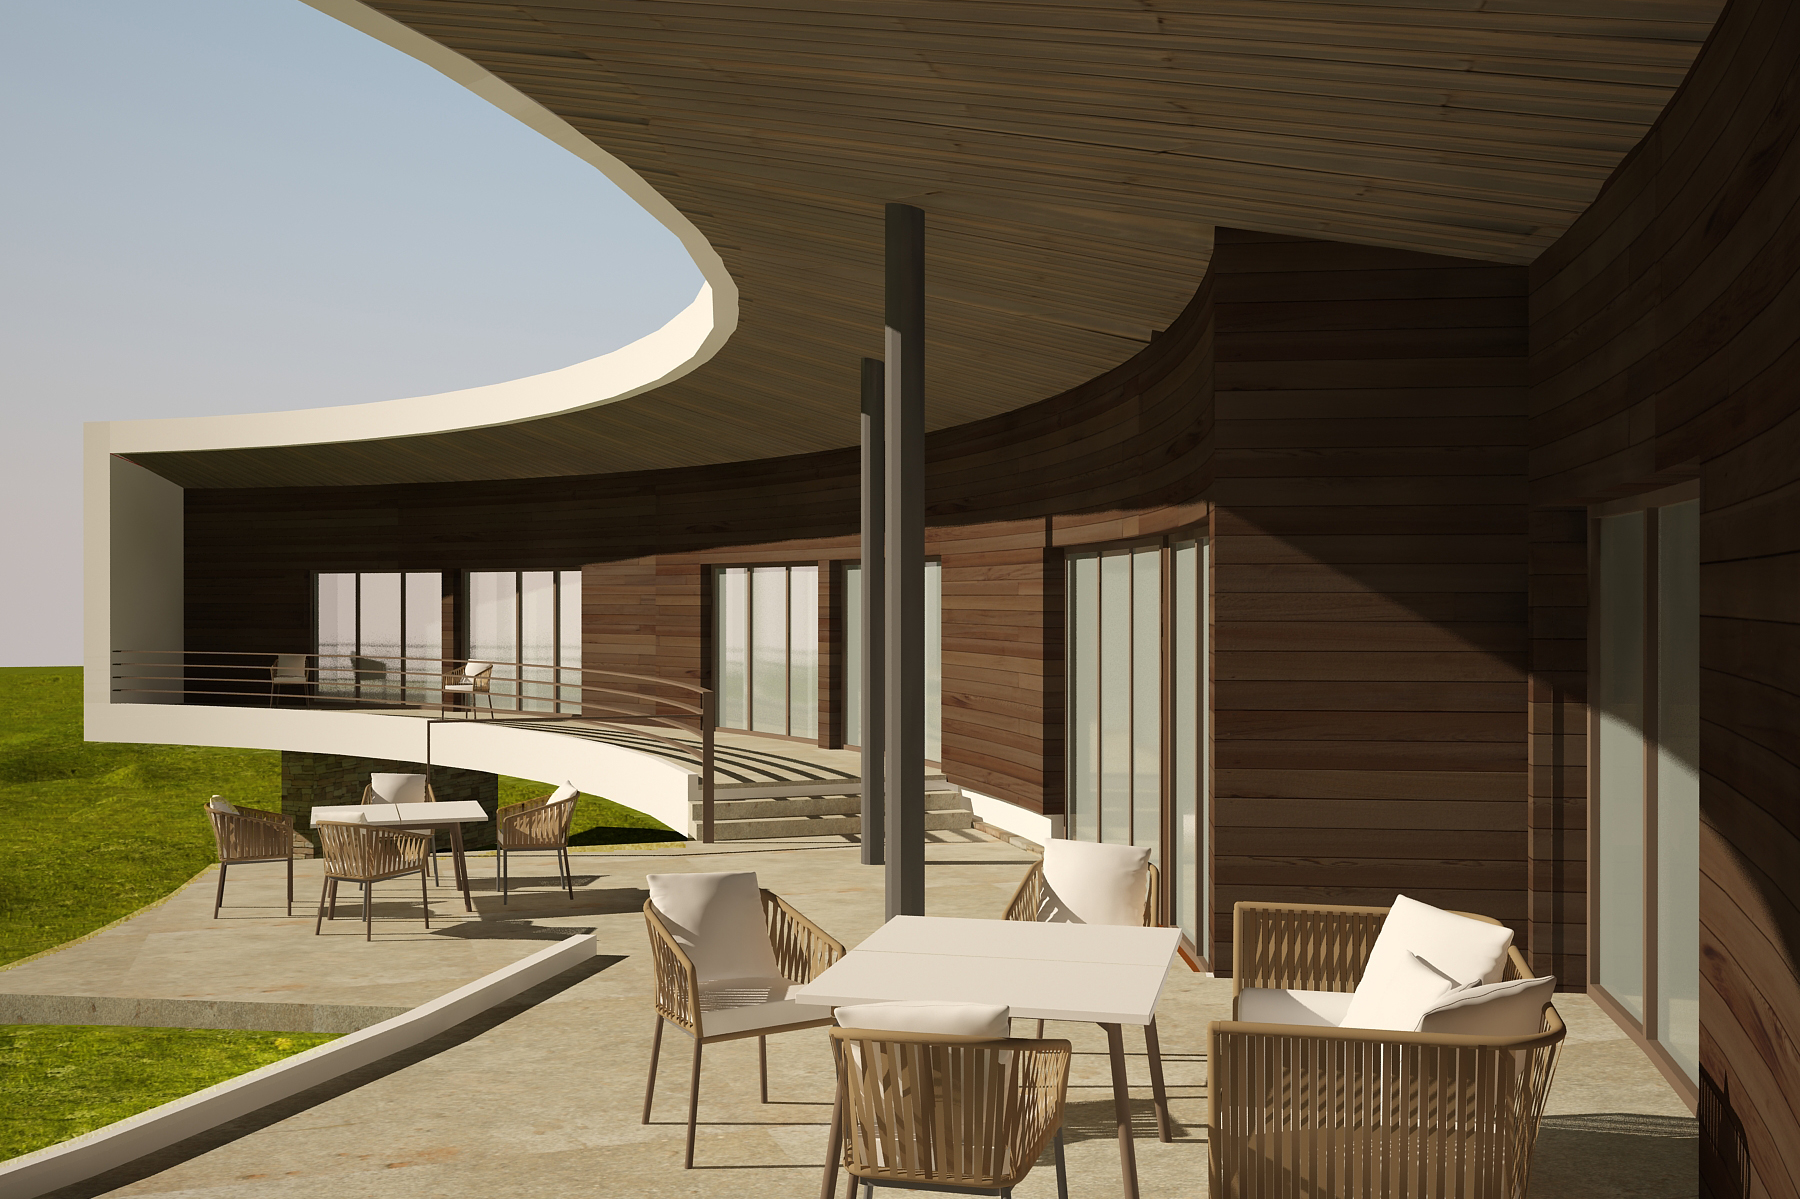 https://nbc-arhitect.ro/wp-content/uploads/2020/10/NBC-Arhitect-_-Breaza-House-_-Breaza-Romania-_-exterior-view_5.jpg